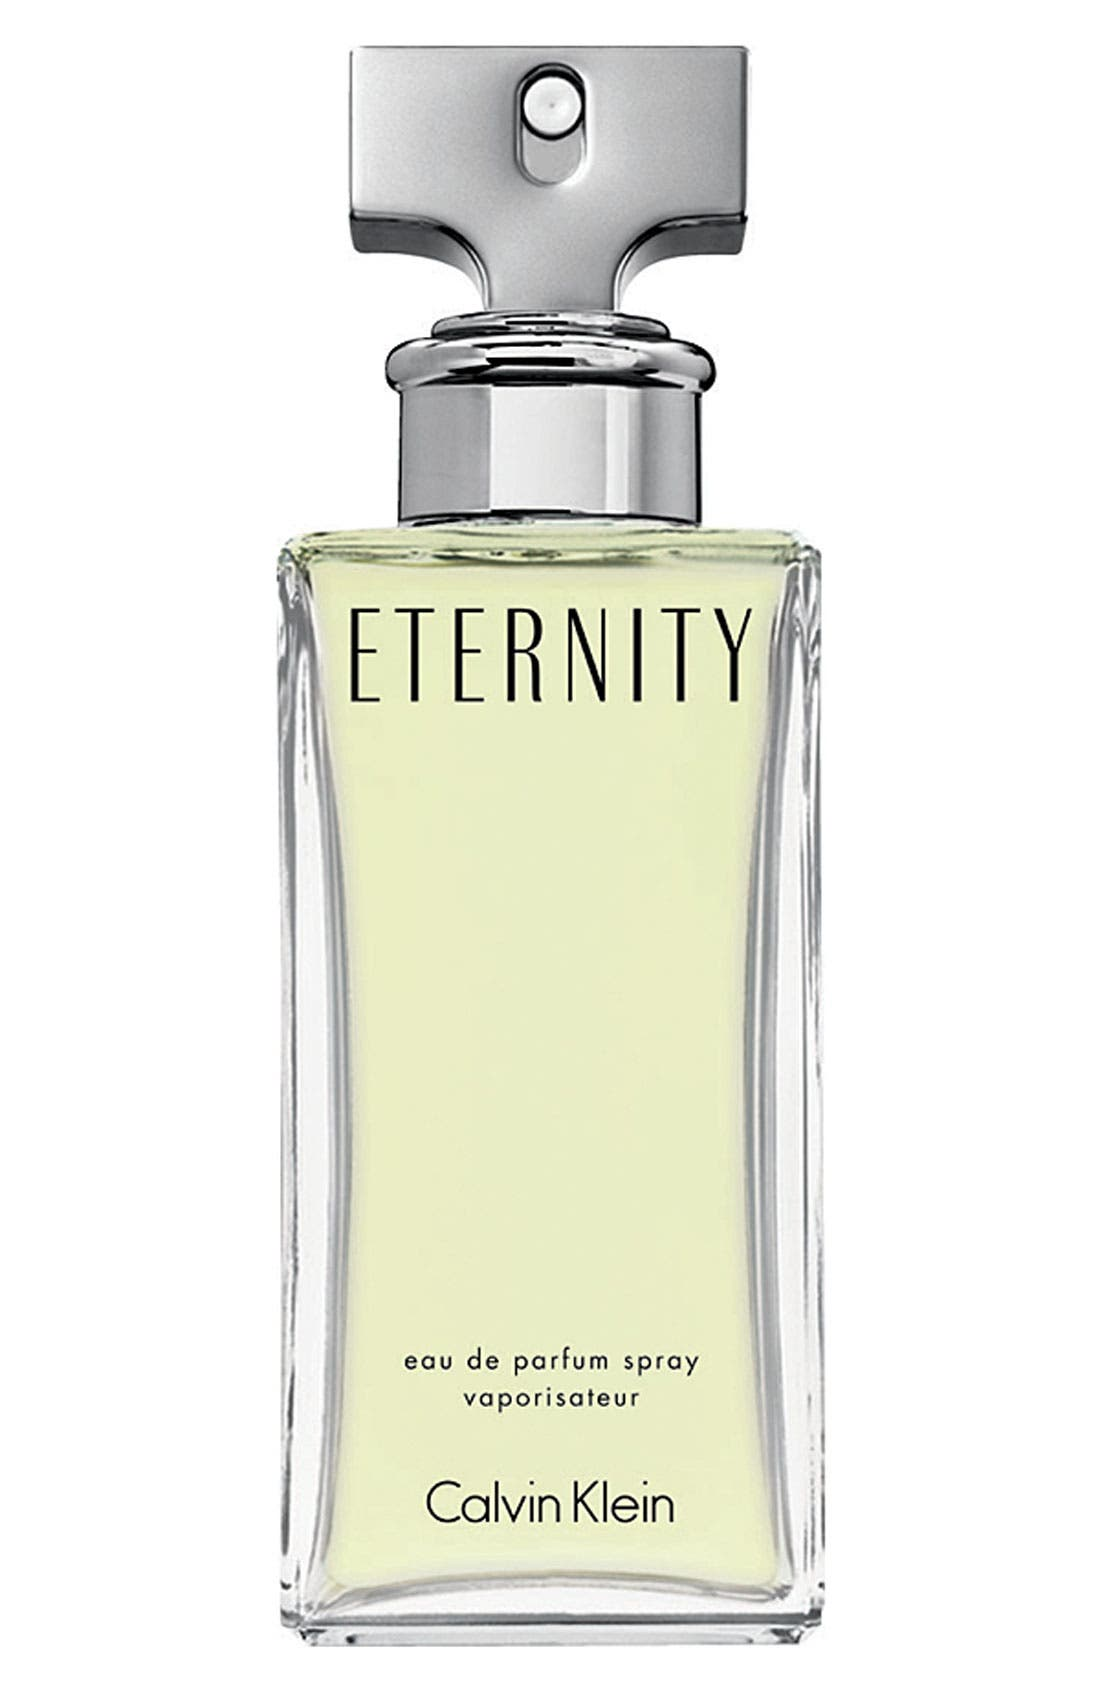 Eternity by Calvin Klein Eau de Parfum Spray